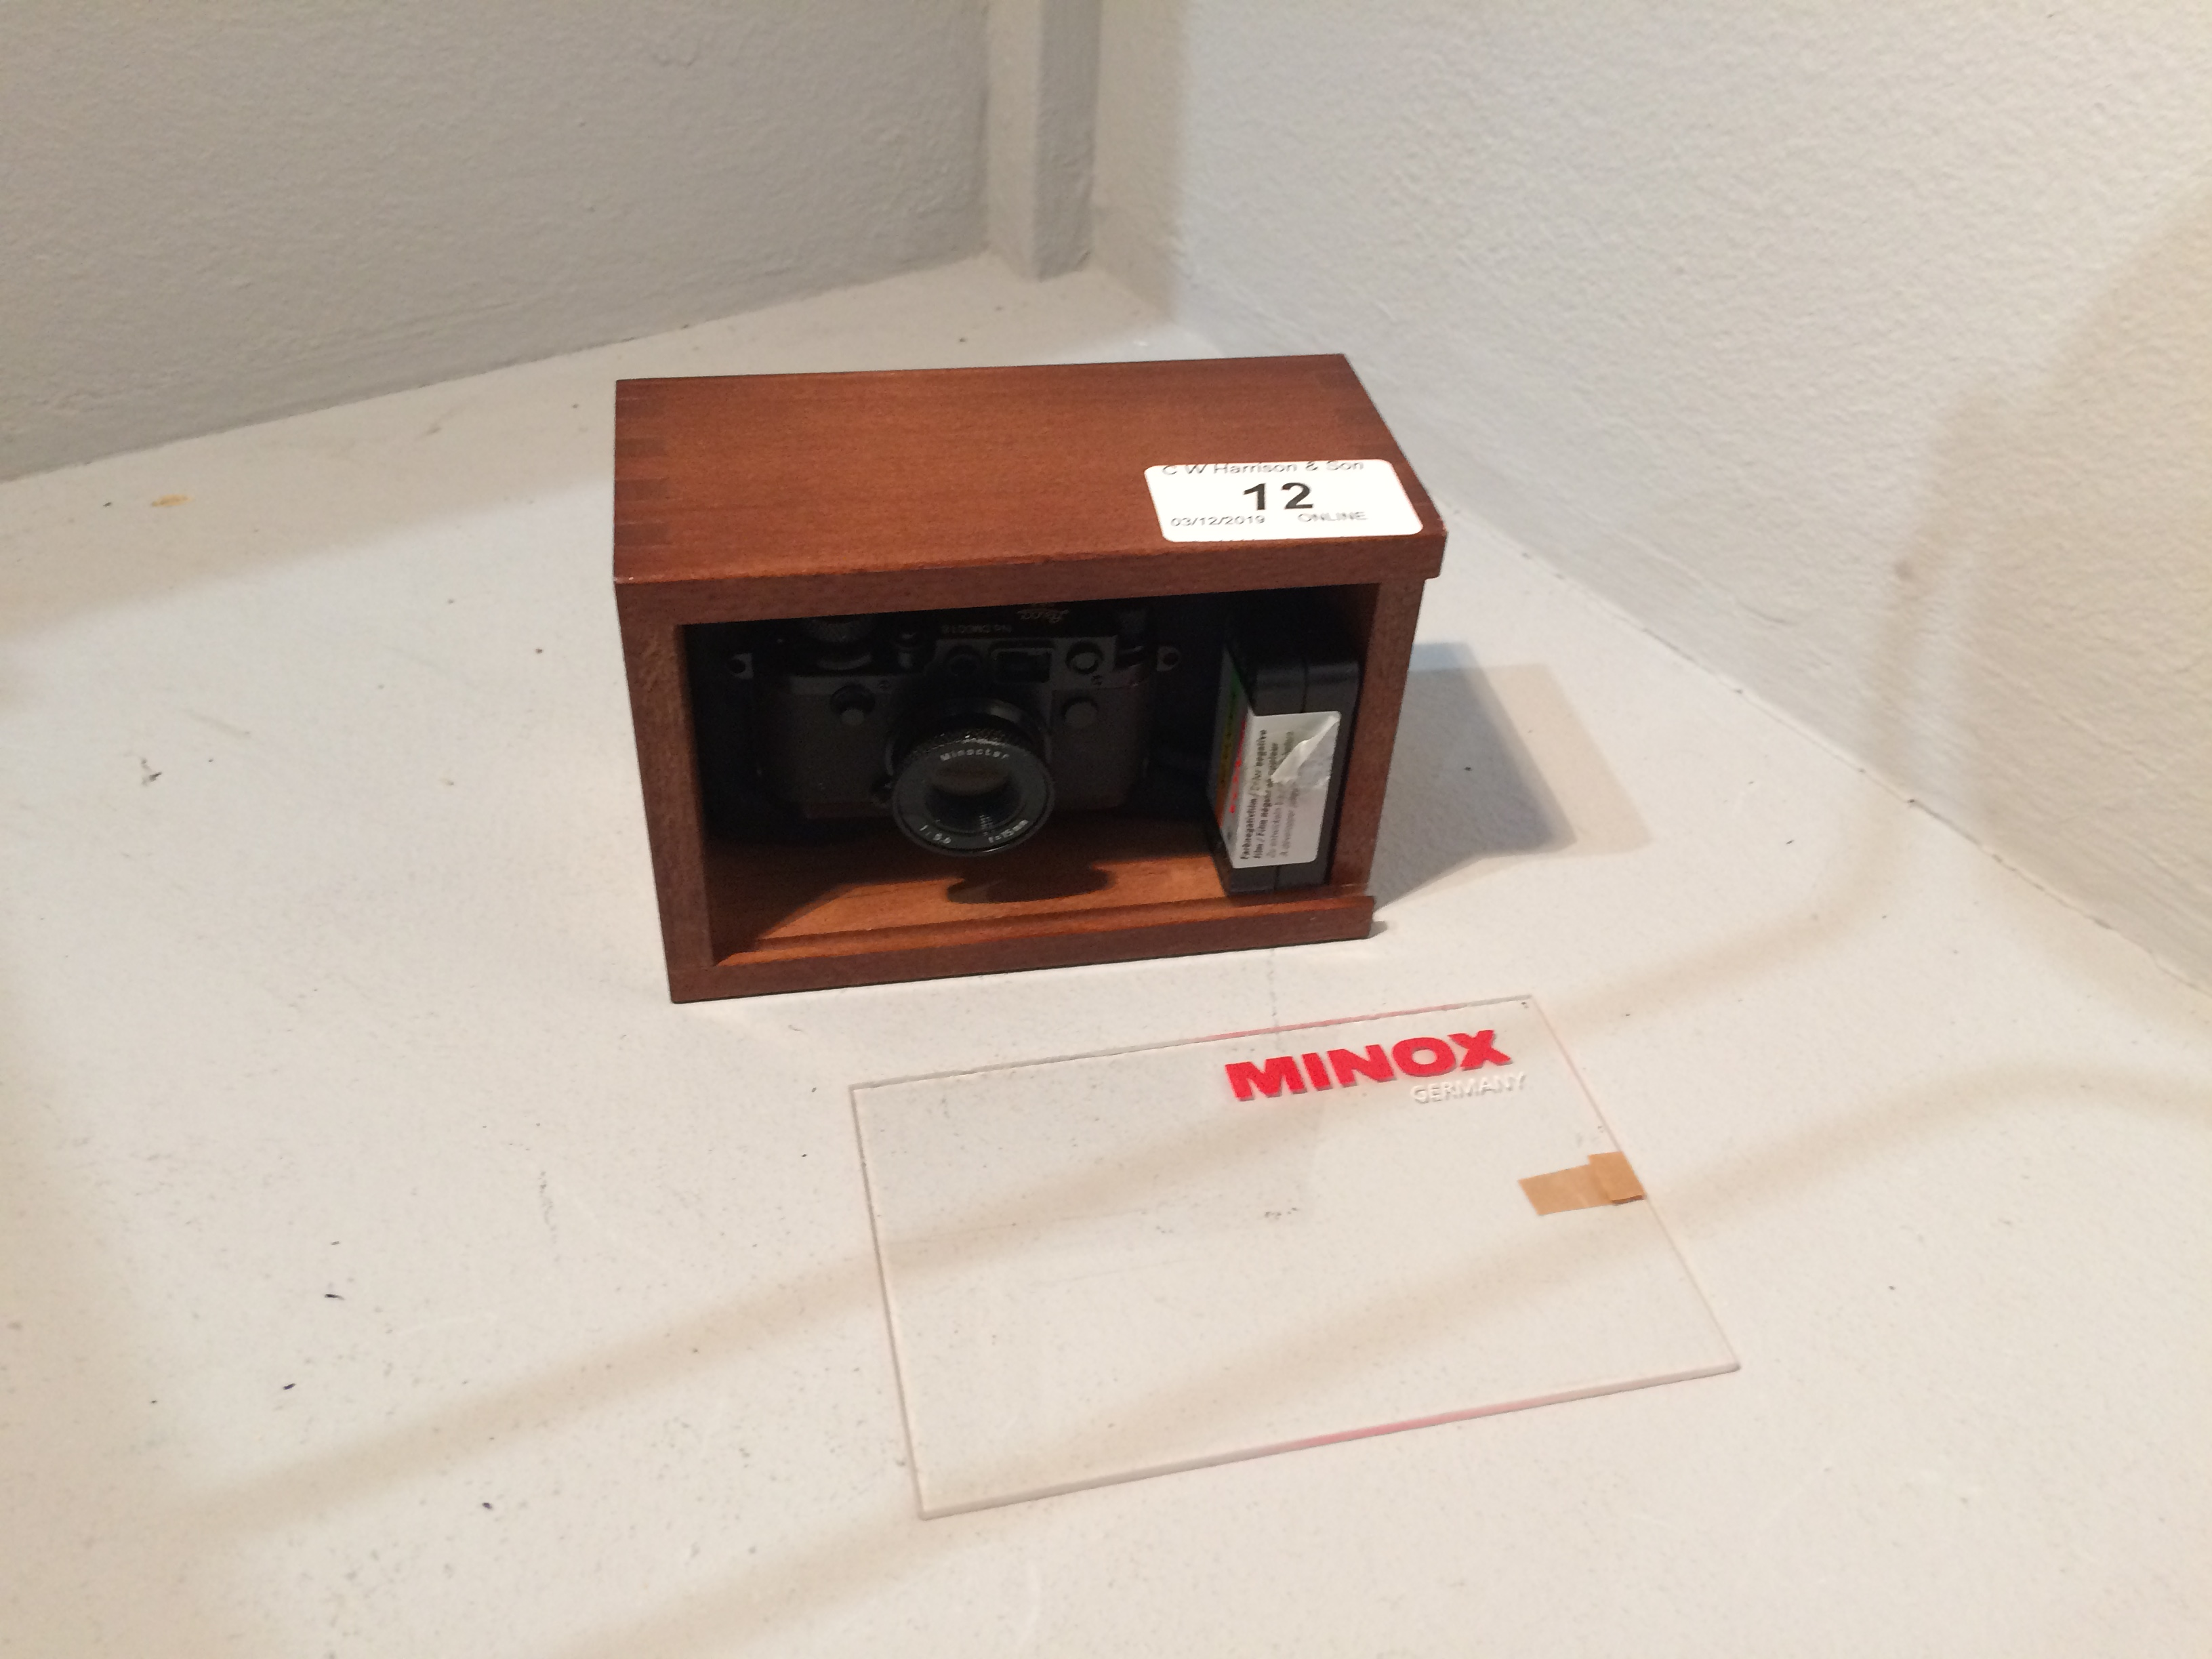 Lot 12 - Minox Camera Collections miniature Leica No. DM80018 camera Minoctar 1..5.